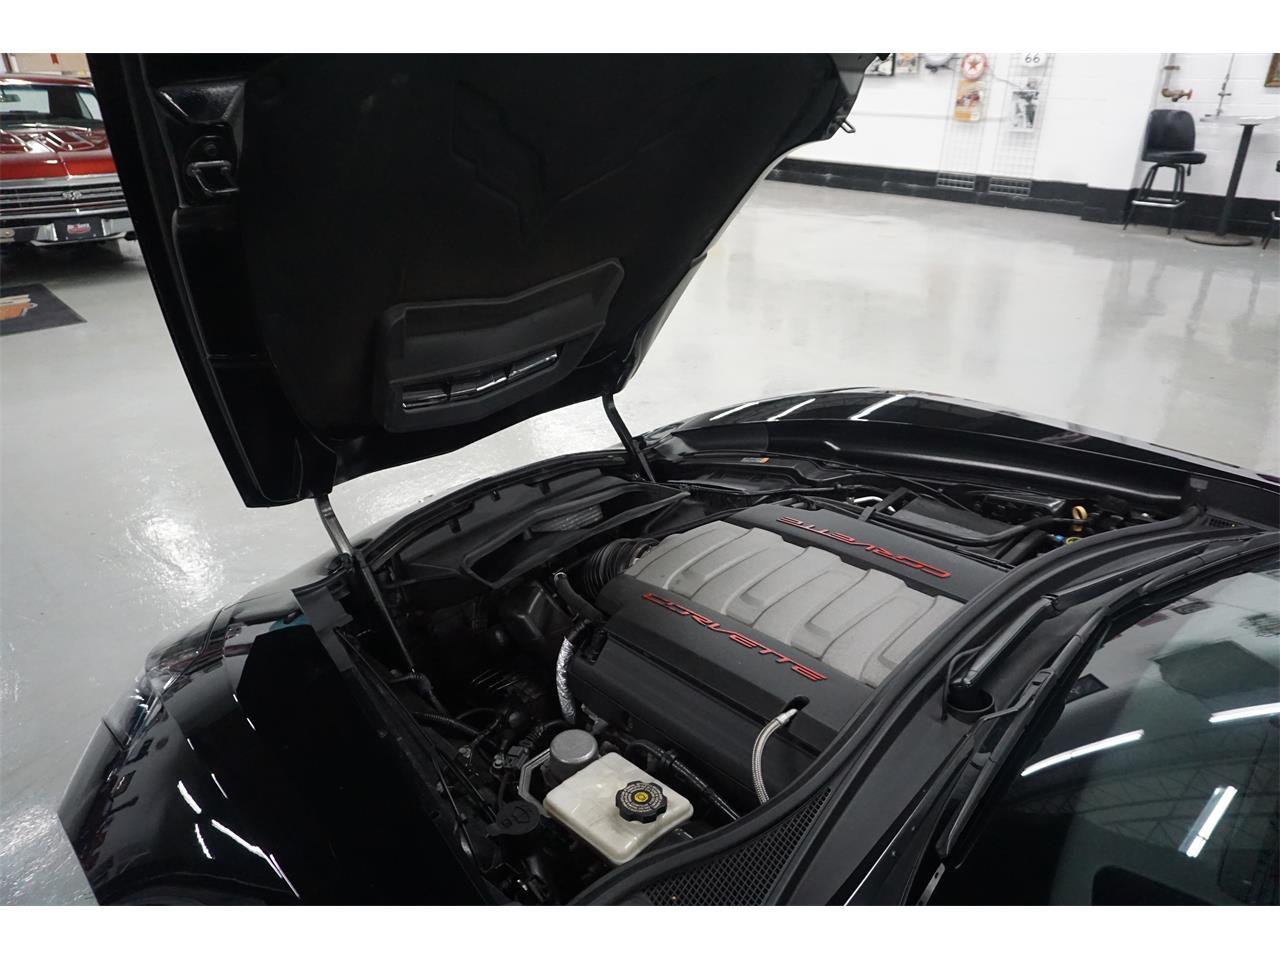 2015 Chevrolet Corvette (CC-1385959) for sale in Glen Burnie, Maryland